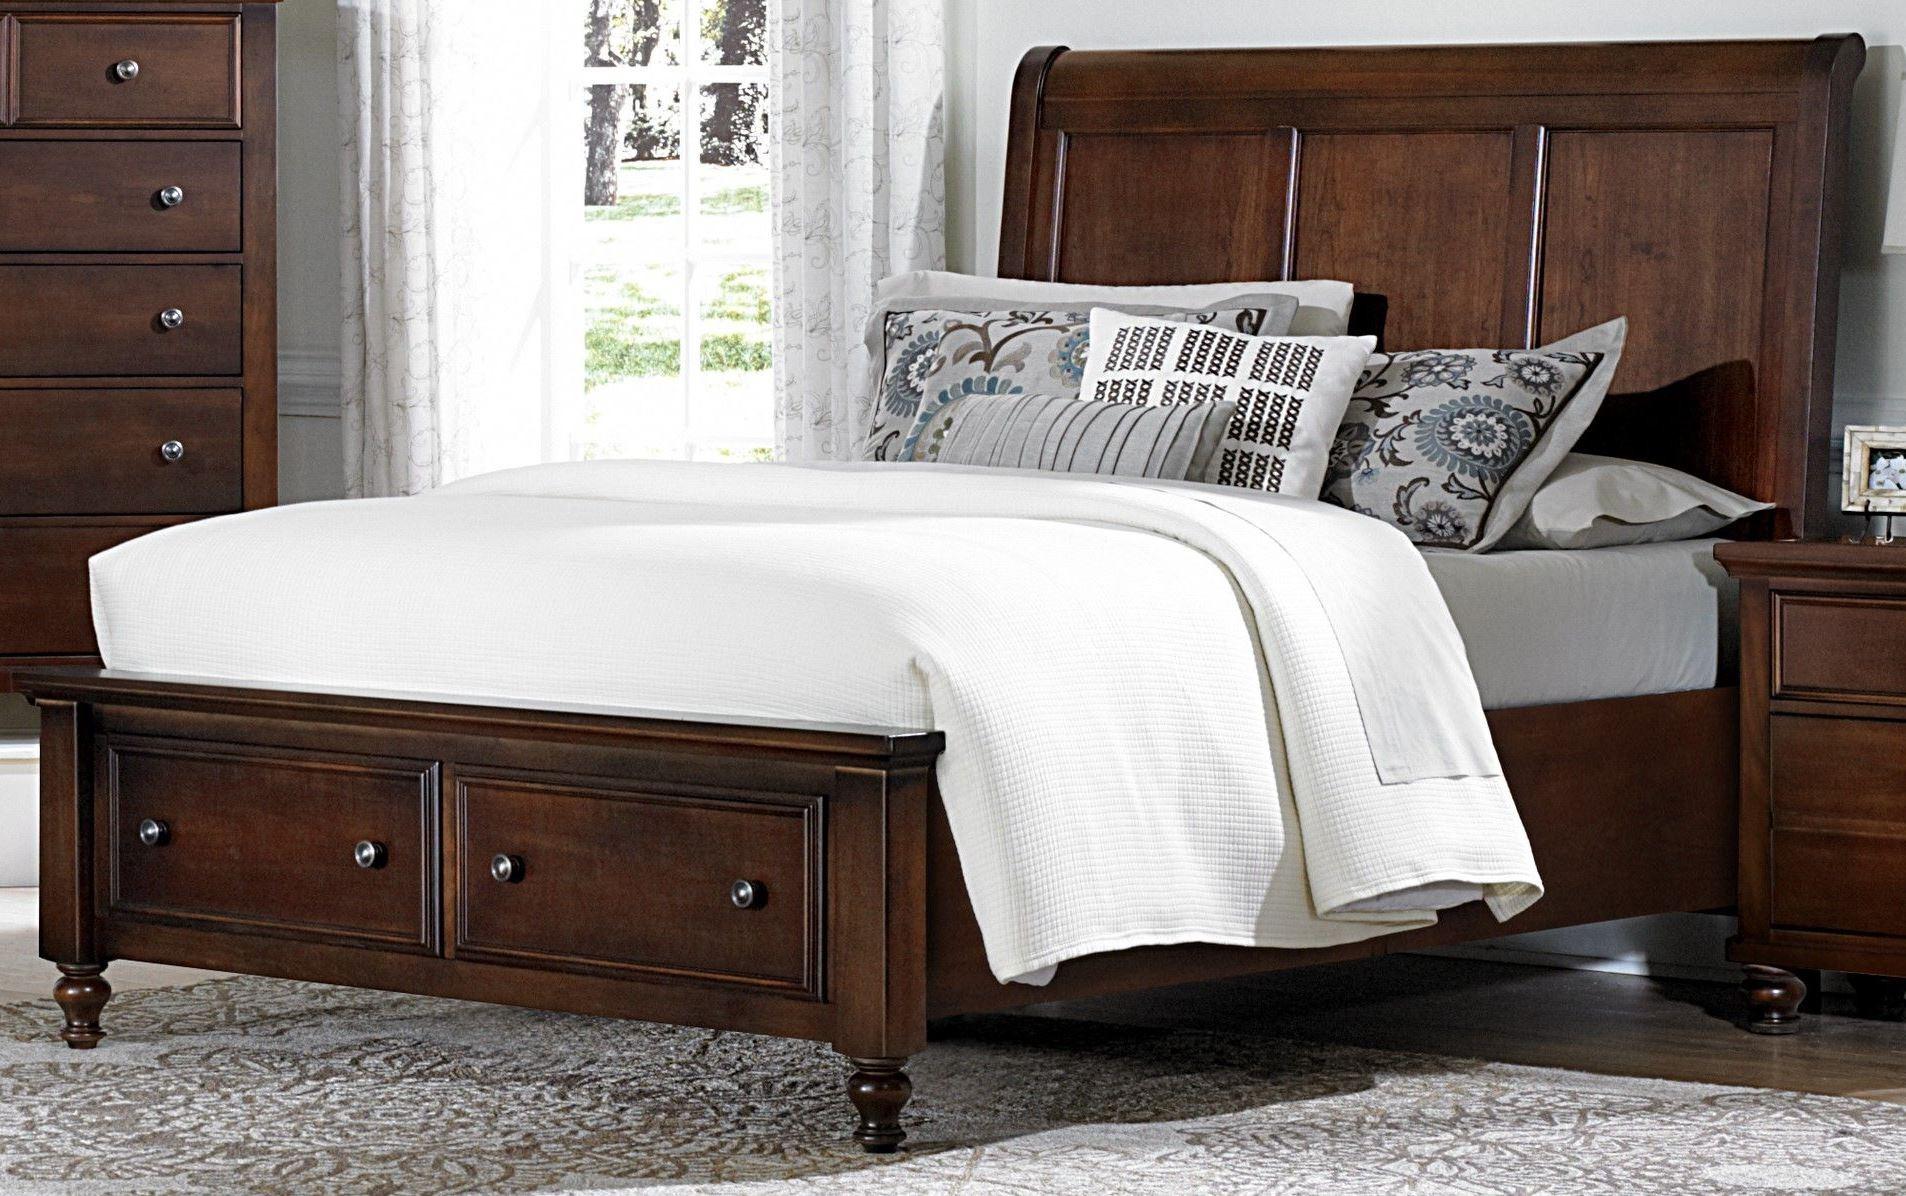 Ellington cherry king sleigh storage bed from vaughan for Ellington bedroom set